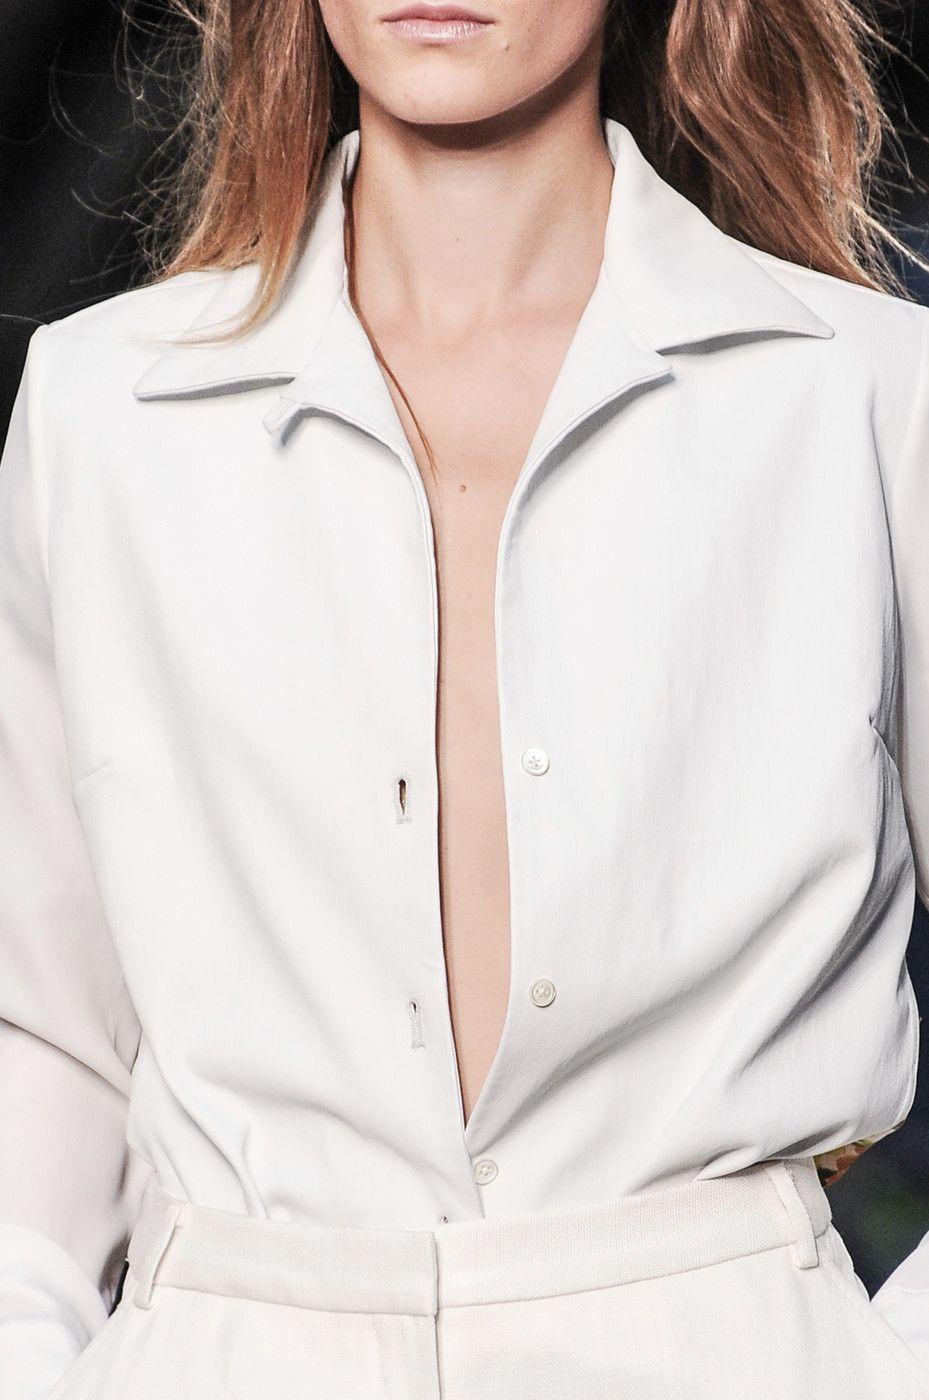 Paul Smith SS14   Minimal + Chic   camisa escotada´+ blanco